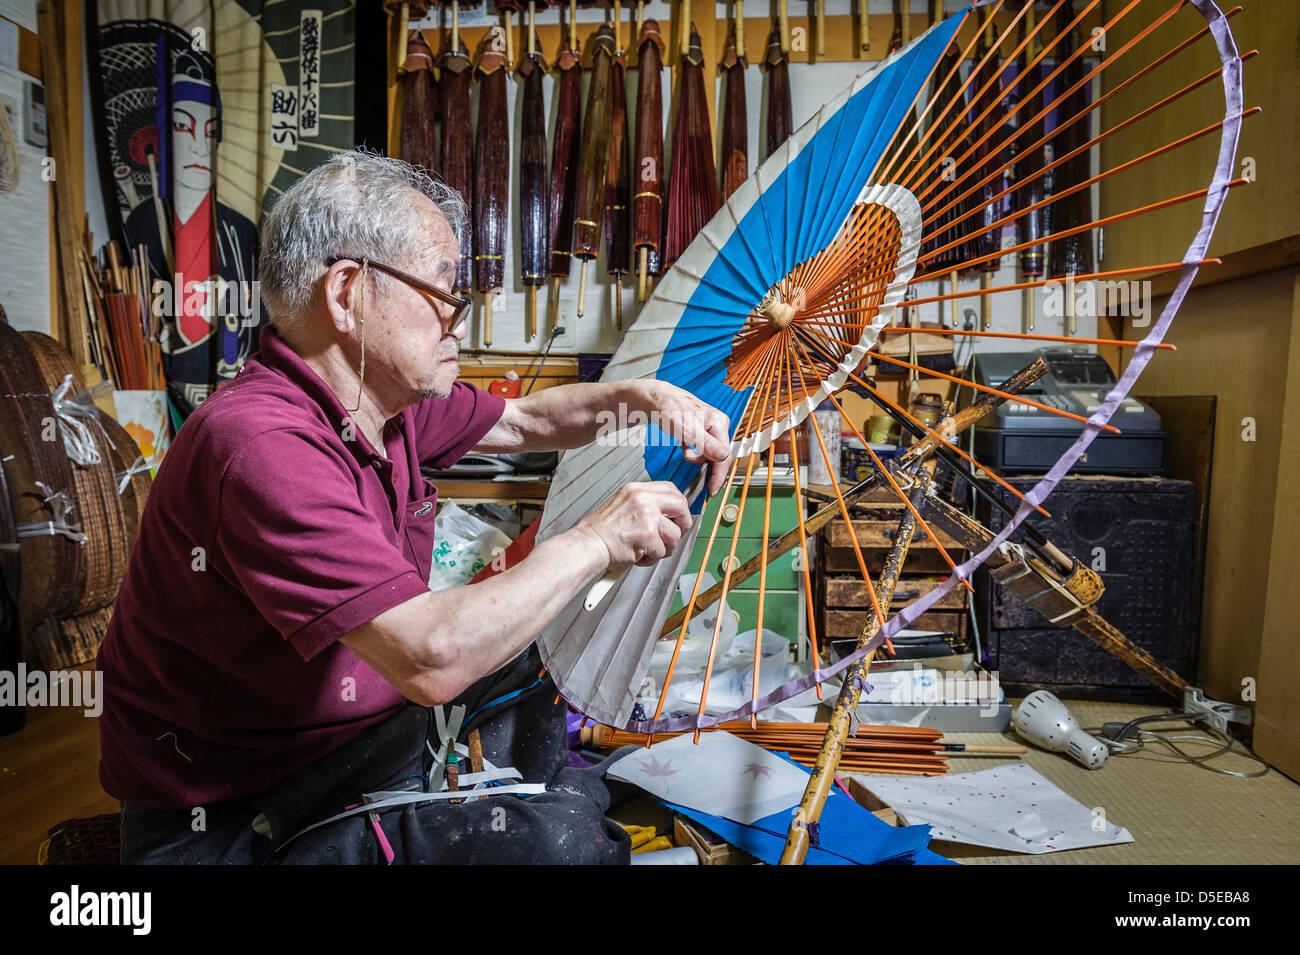 Mr Hiroshi Matsuda making wagasa, the Japanese, traditional umbrellas, in his workshop, Kanazawa, Honshu, Japan - Stock Image